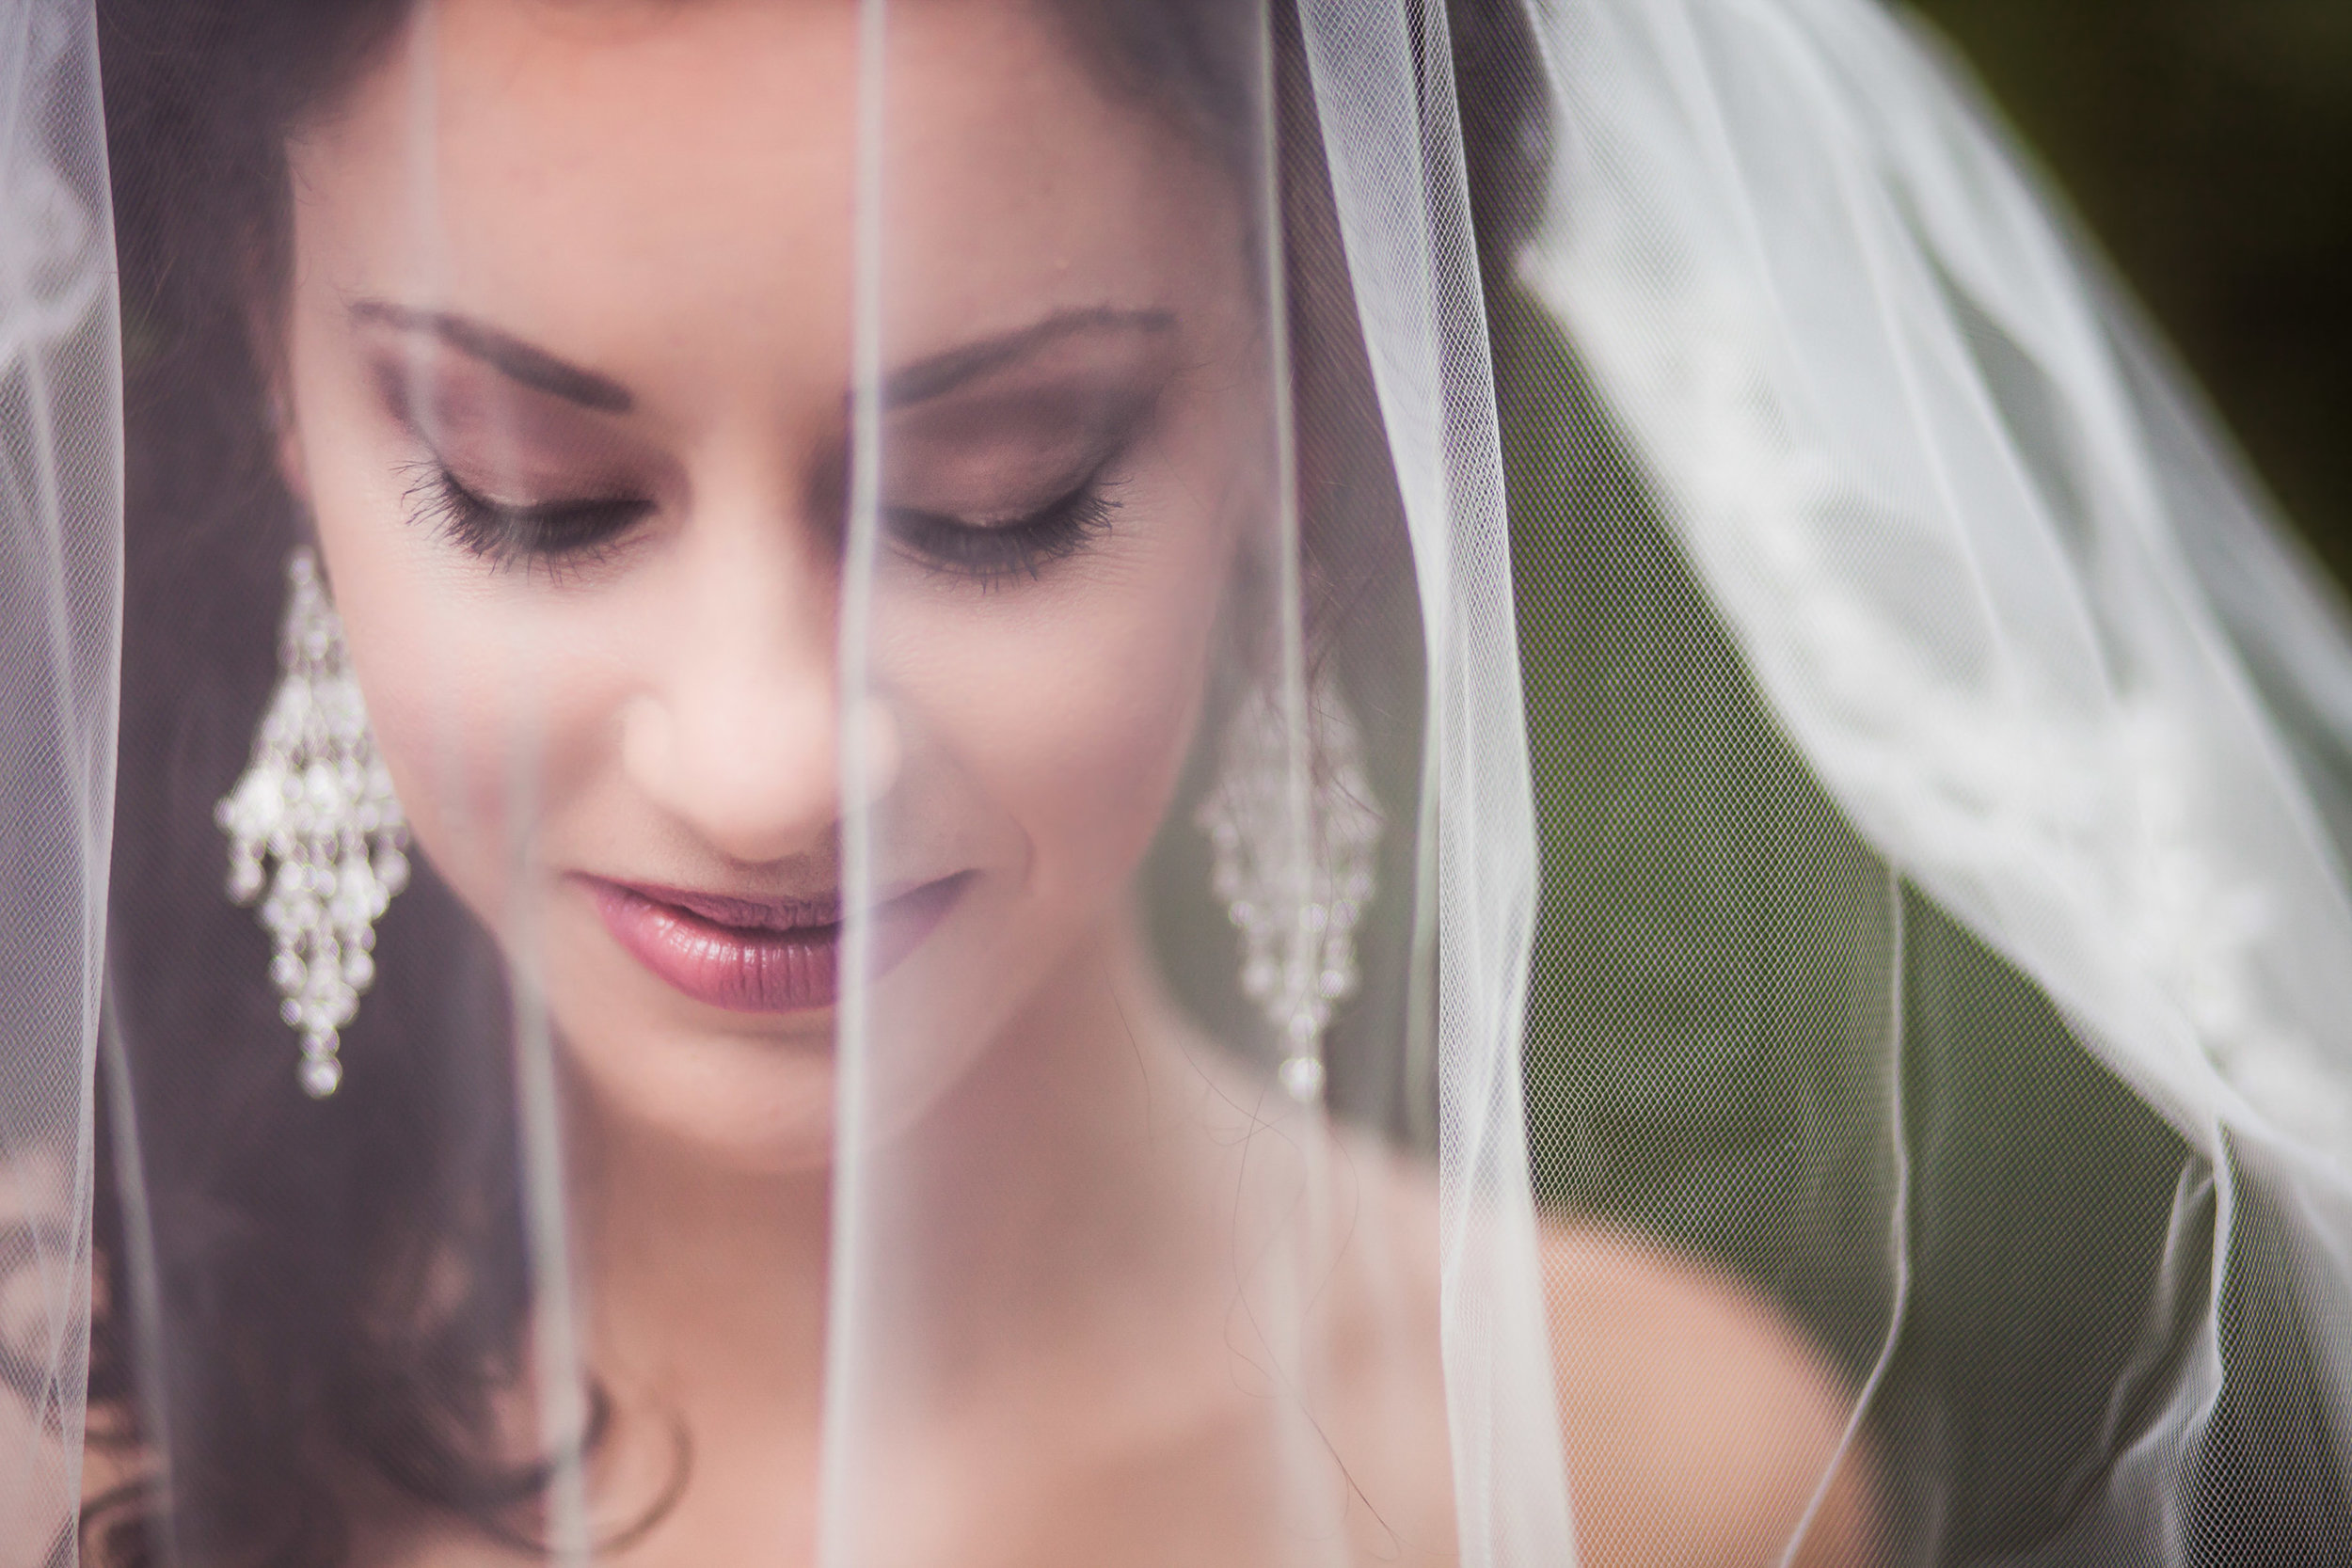 North-Georgia-Atlanta-Wedding-Brianna-Joseph-Photography-6 - Copy.jpg